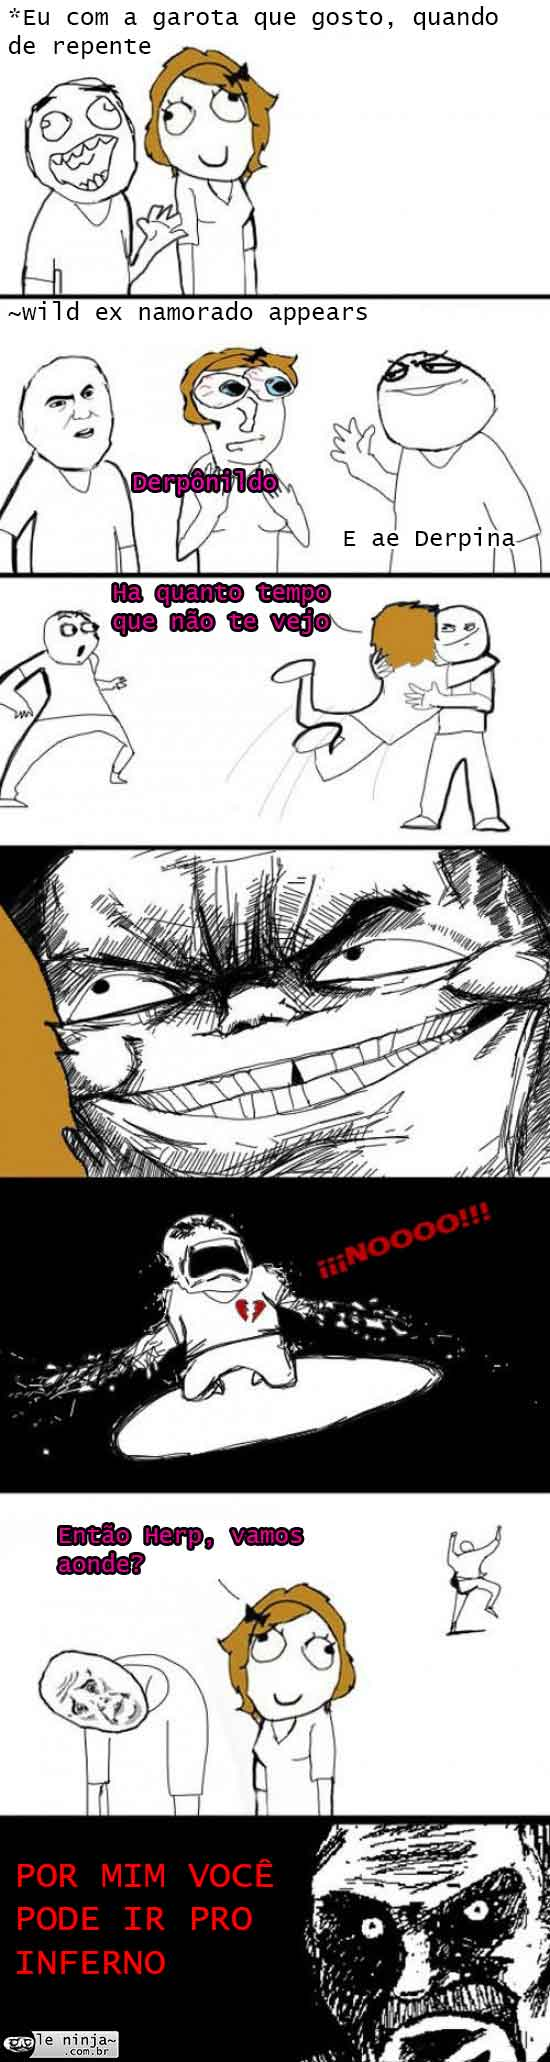 Tirinhas memes - Página 3 Garota